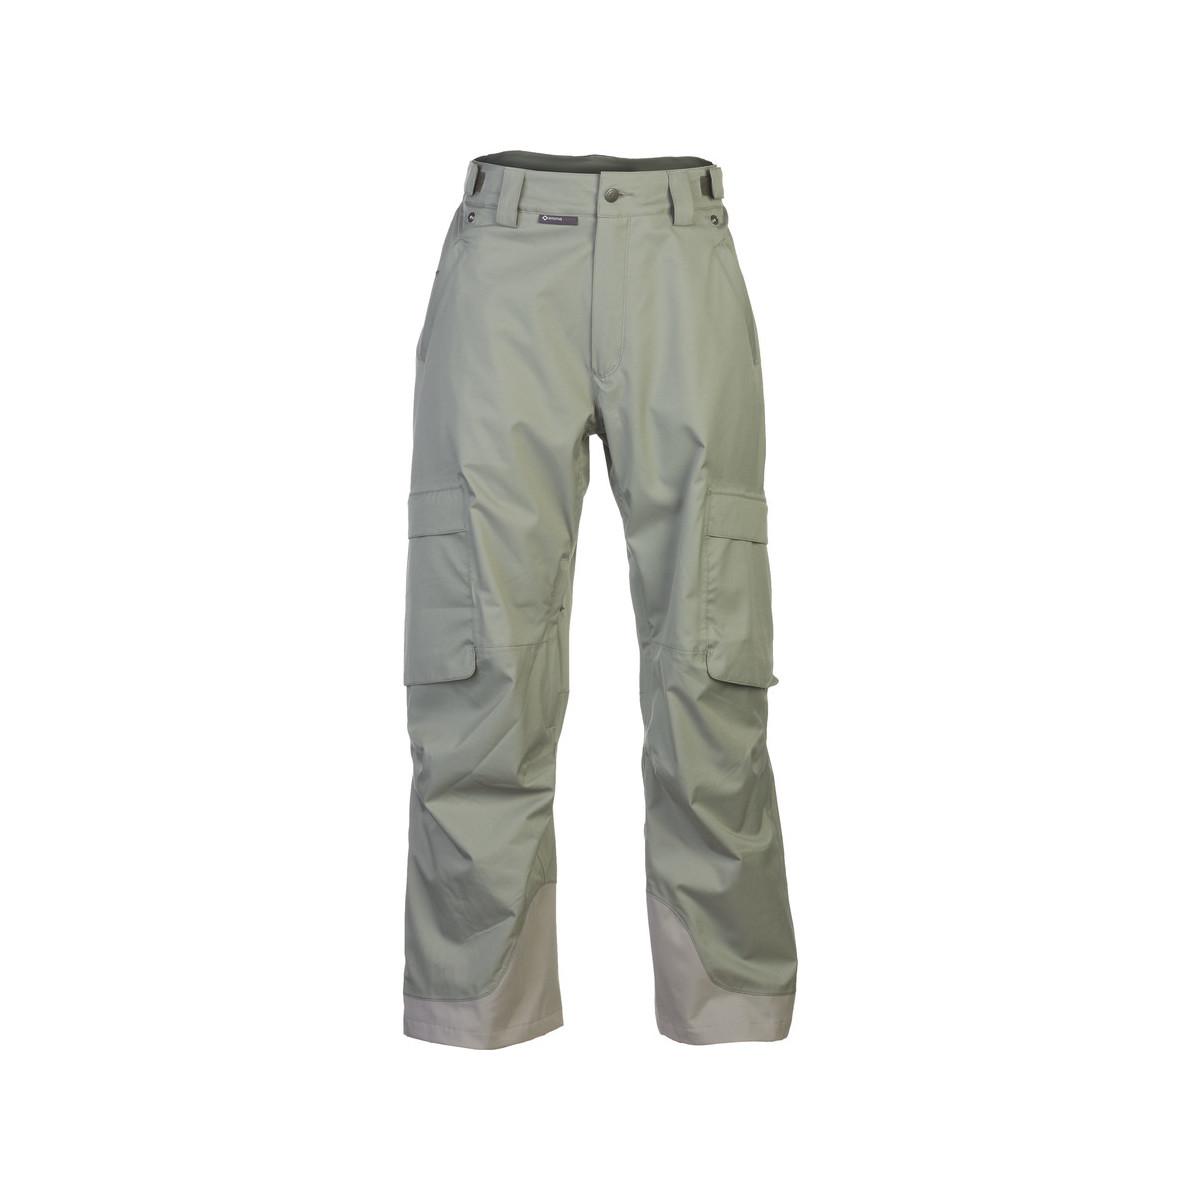 Flylow Gear Stash Pant